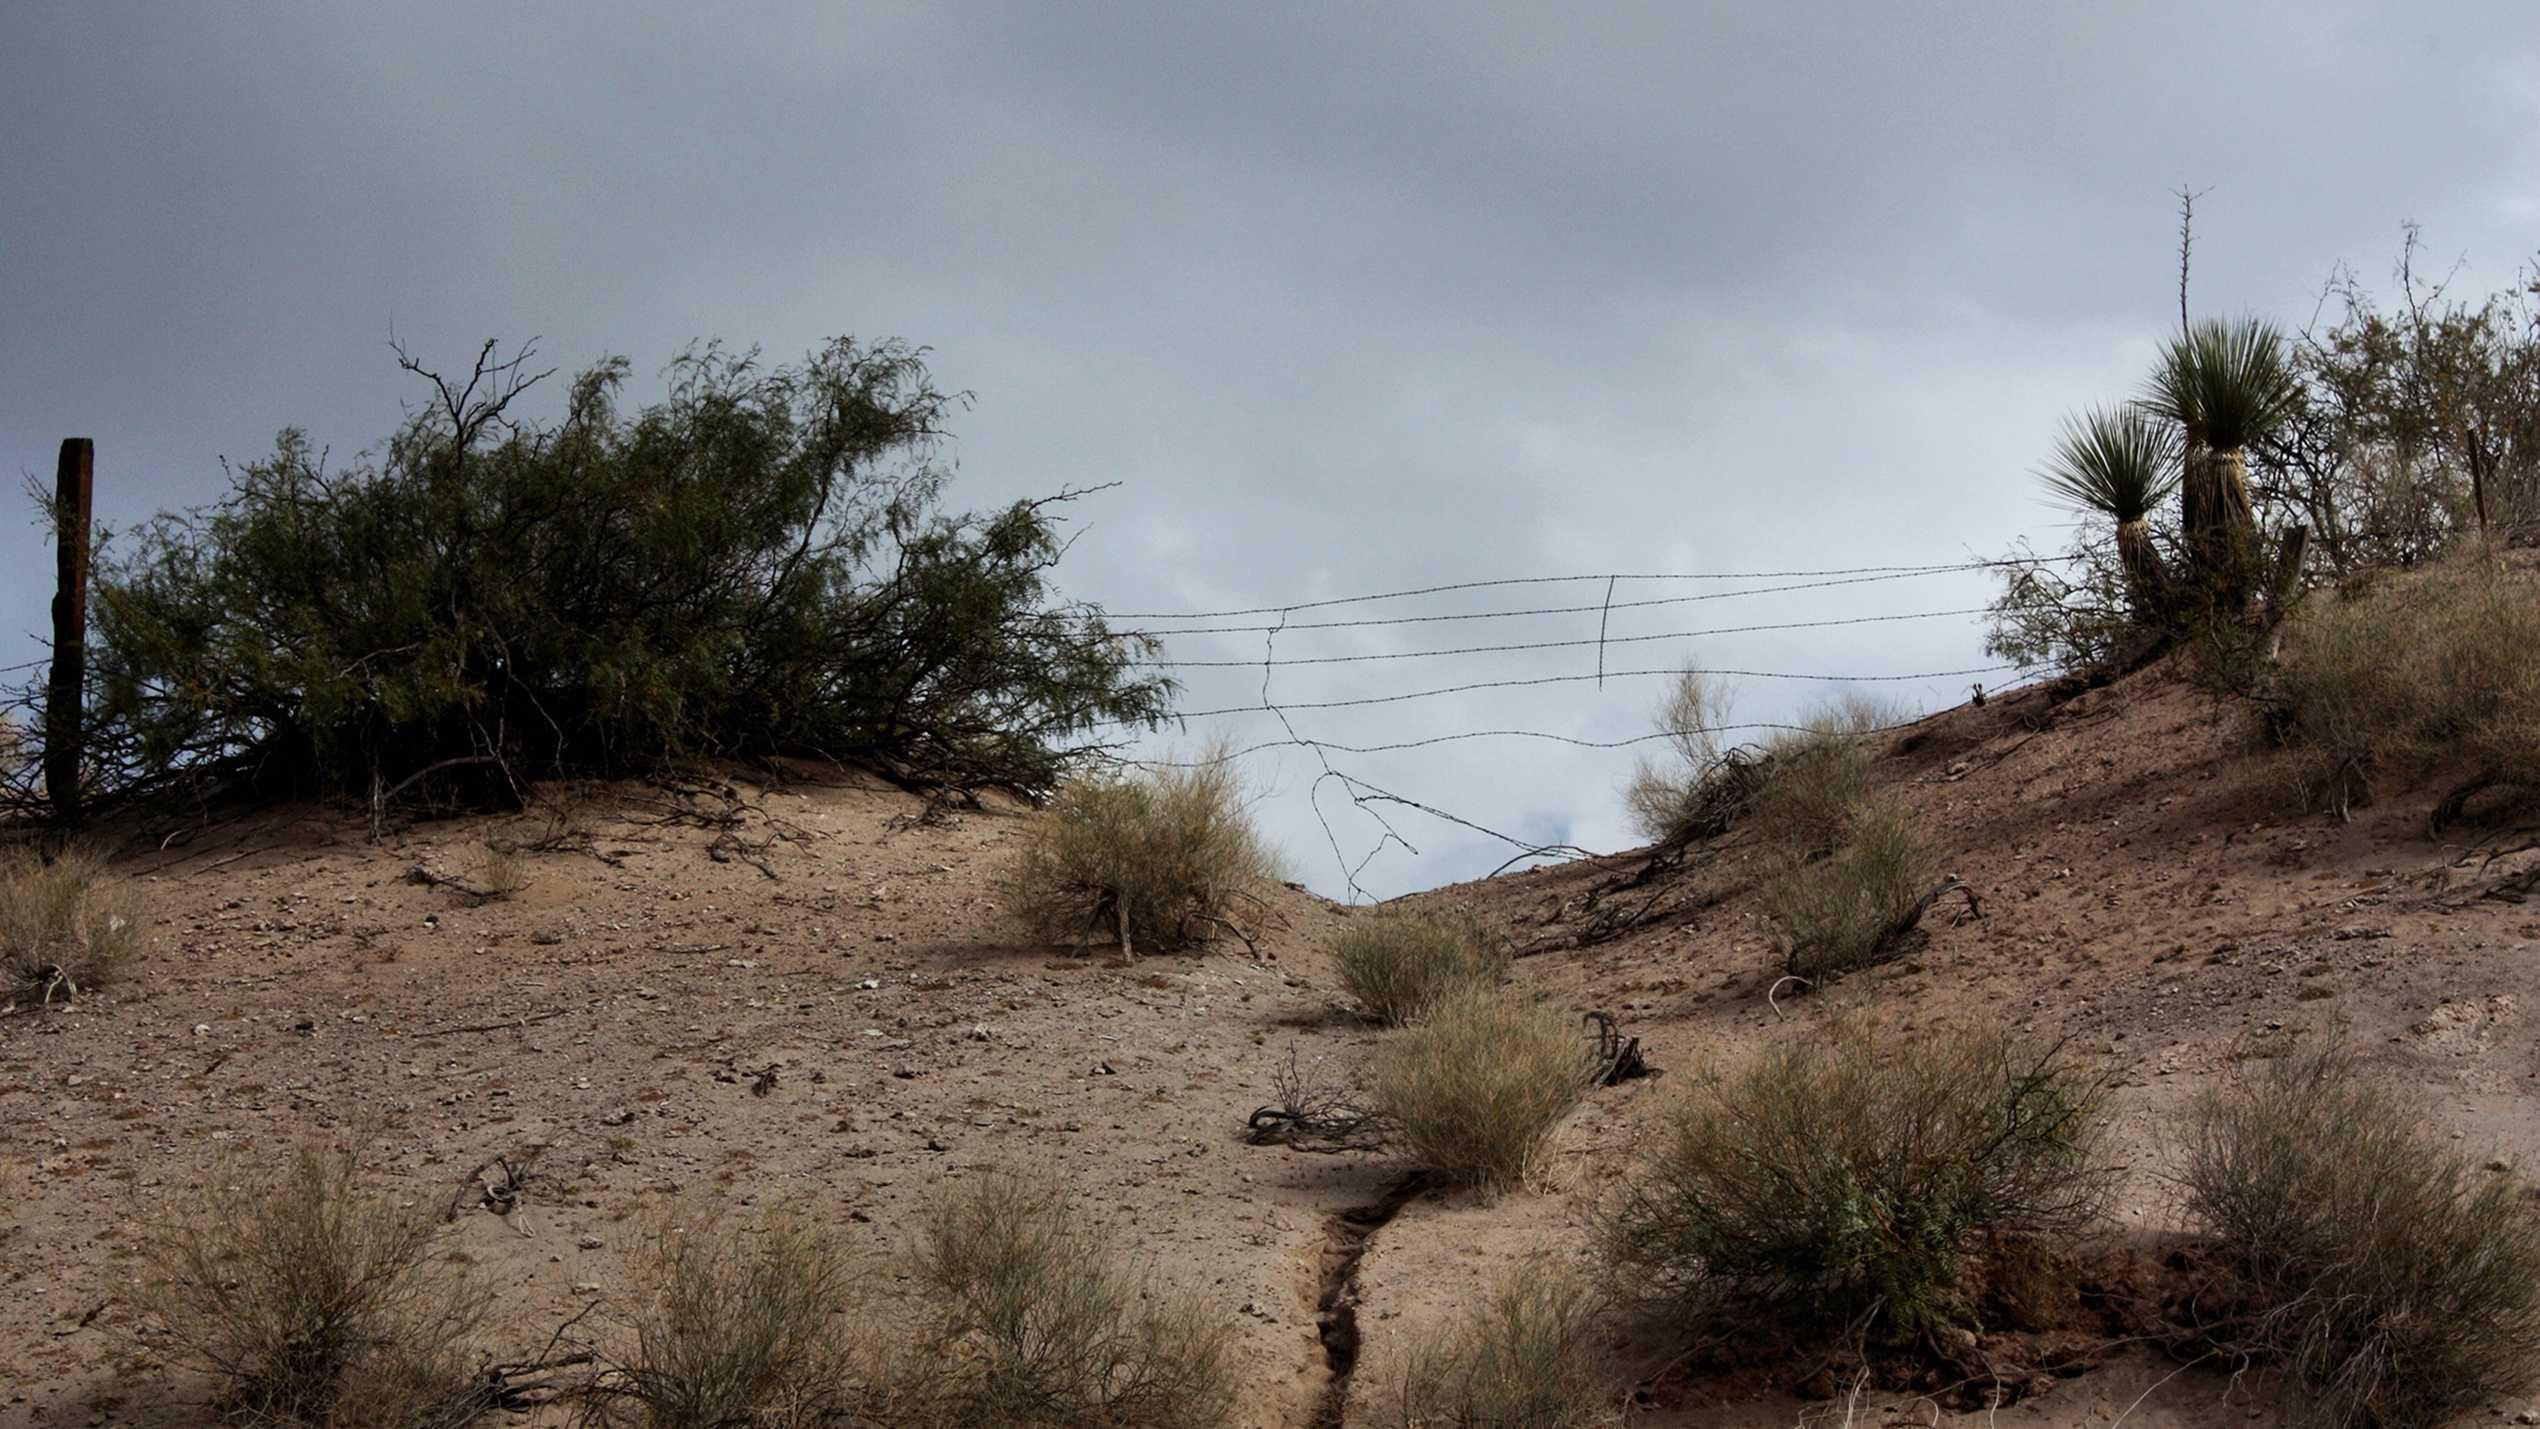 United States-Mexico border